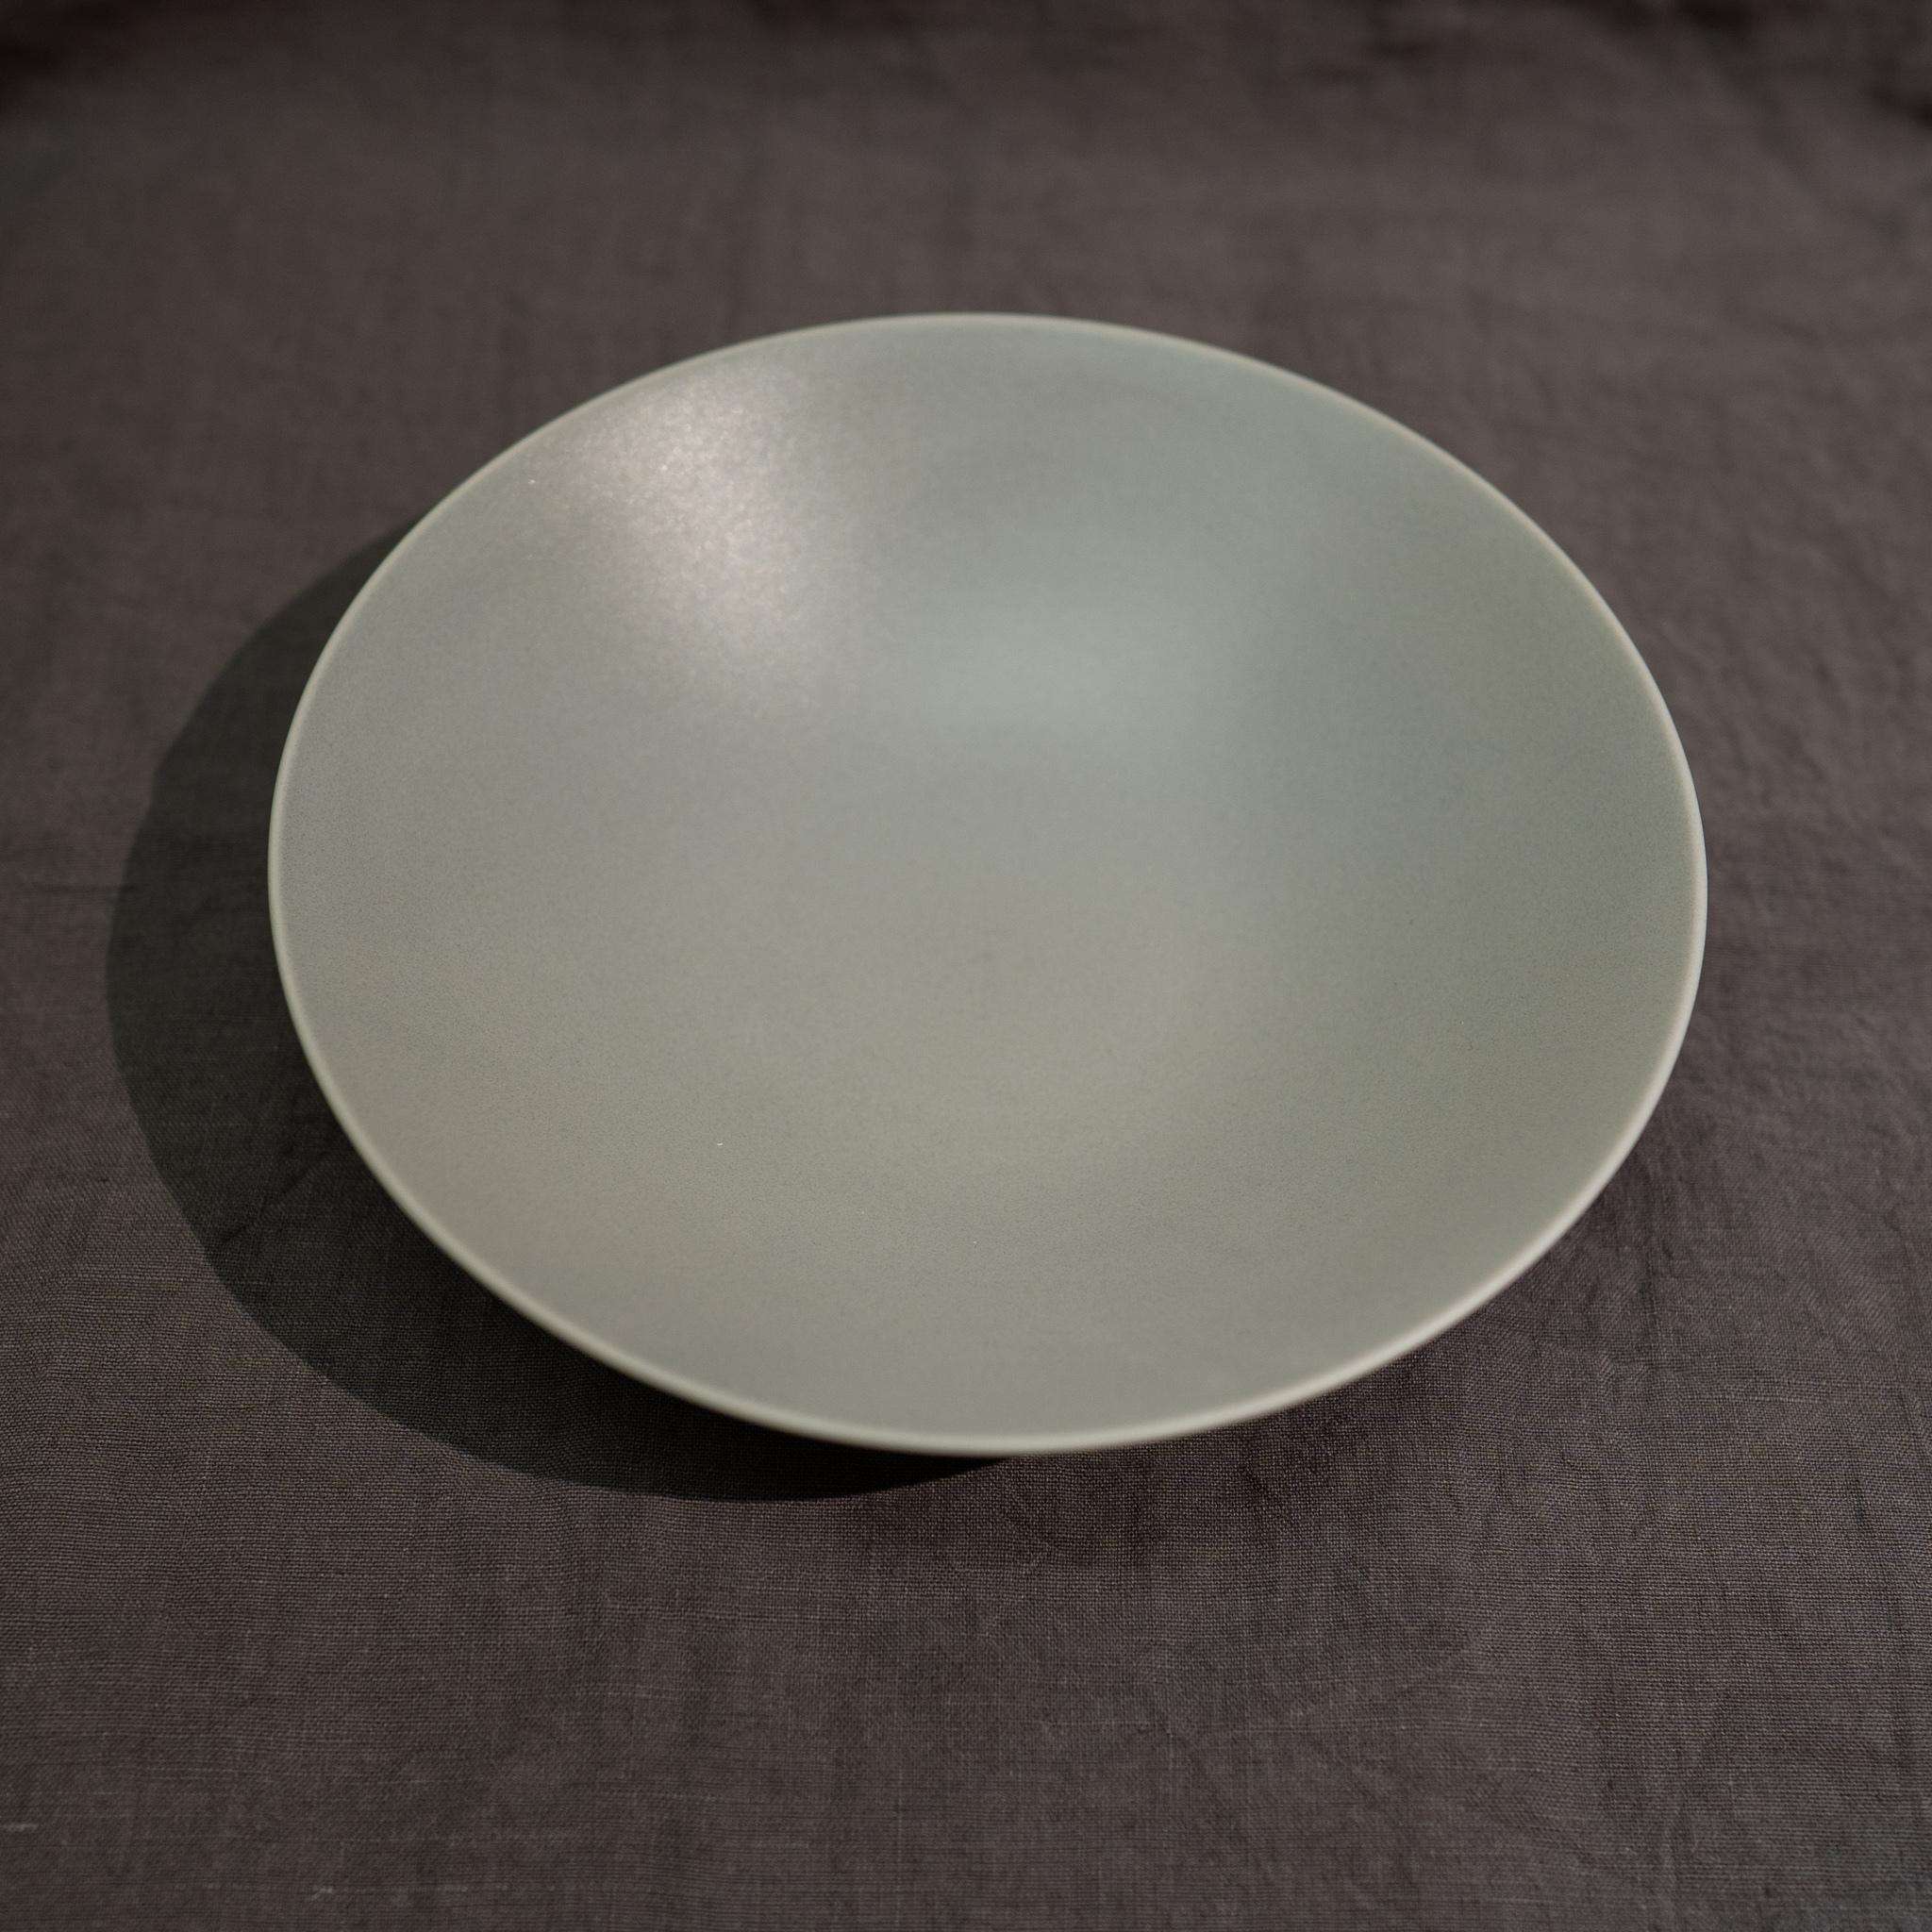 Stoneプレート クープ皿